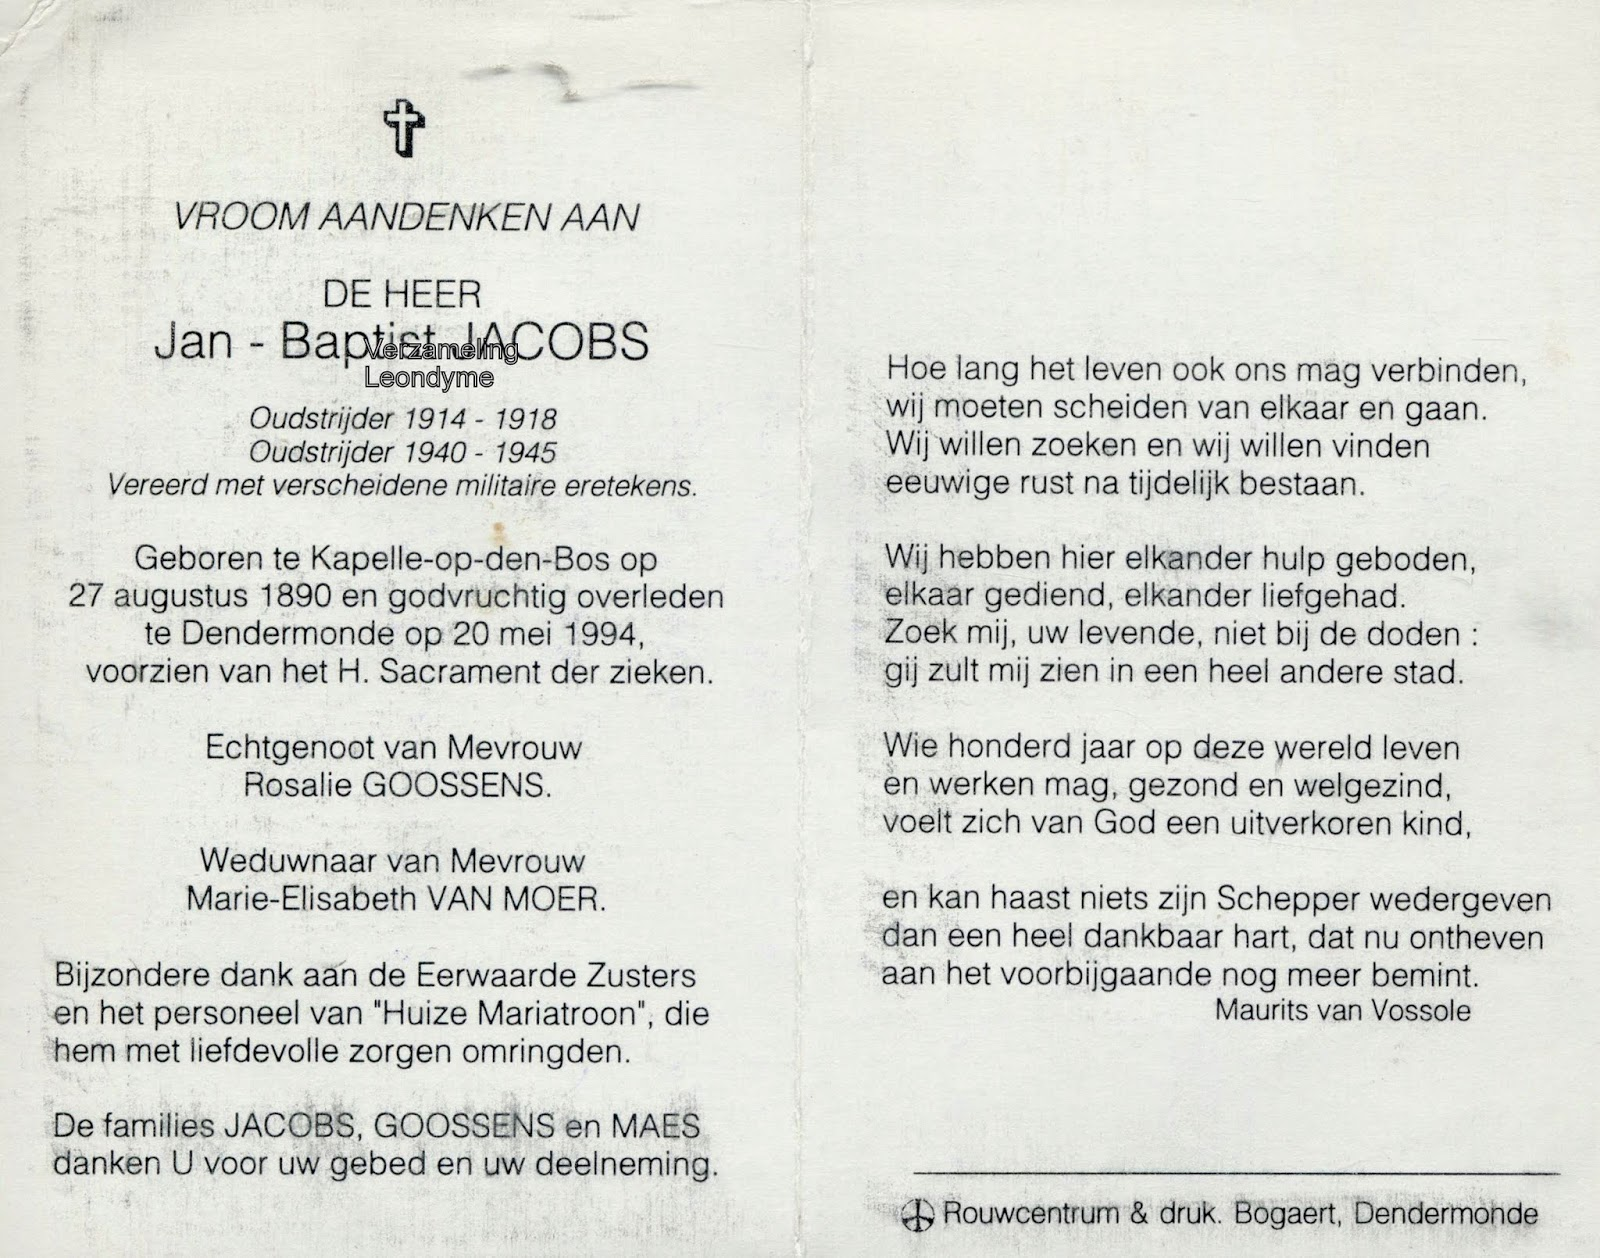 Bidprentje, Jan-Baptist Jacobs 1890-1994. Verzameling Leondyme.